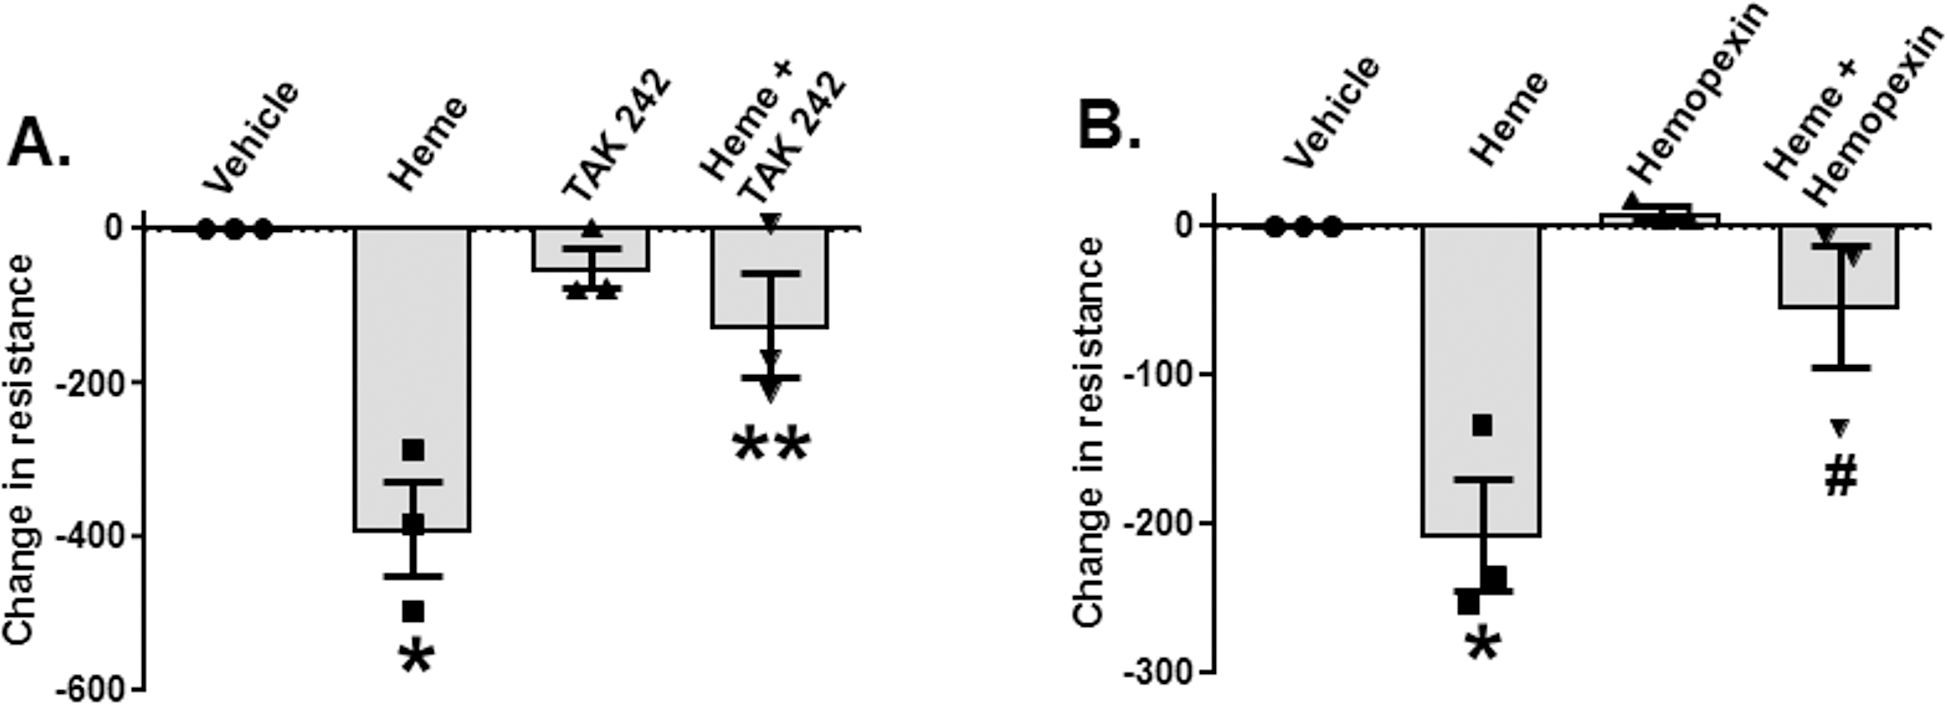 Heme-dependent decreases in endothelial barrier resistance are TLR4-dependent.